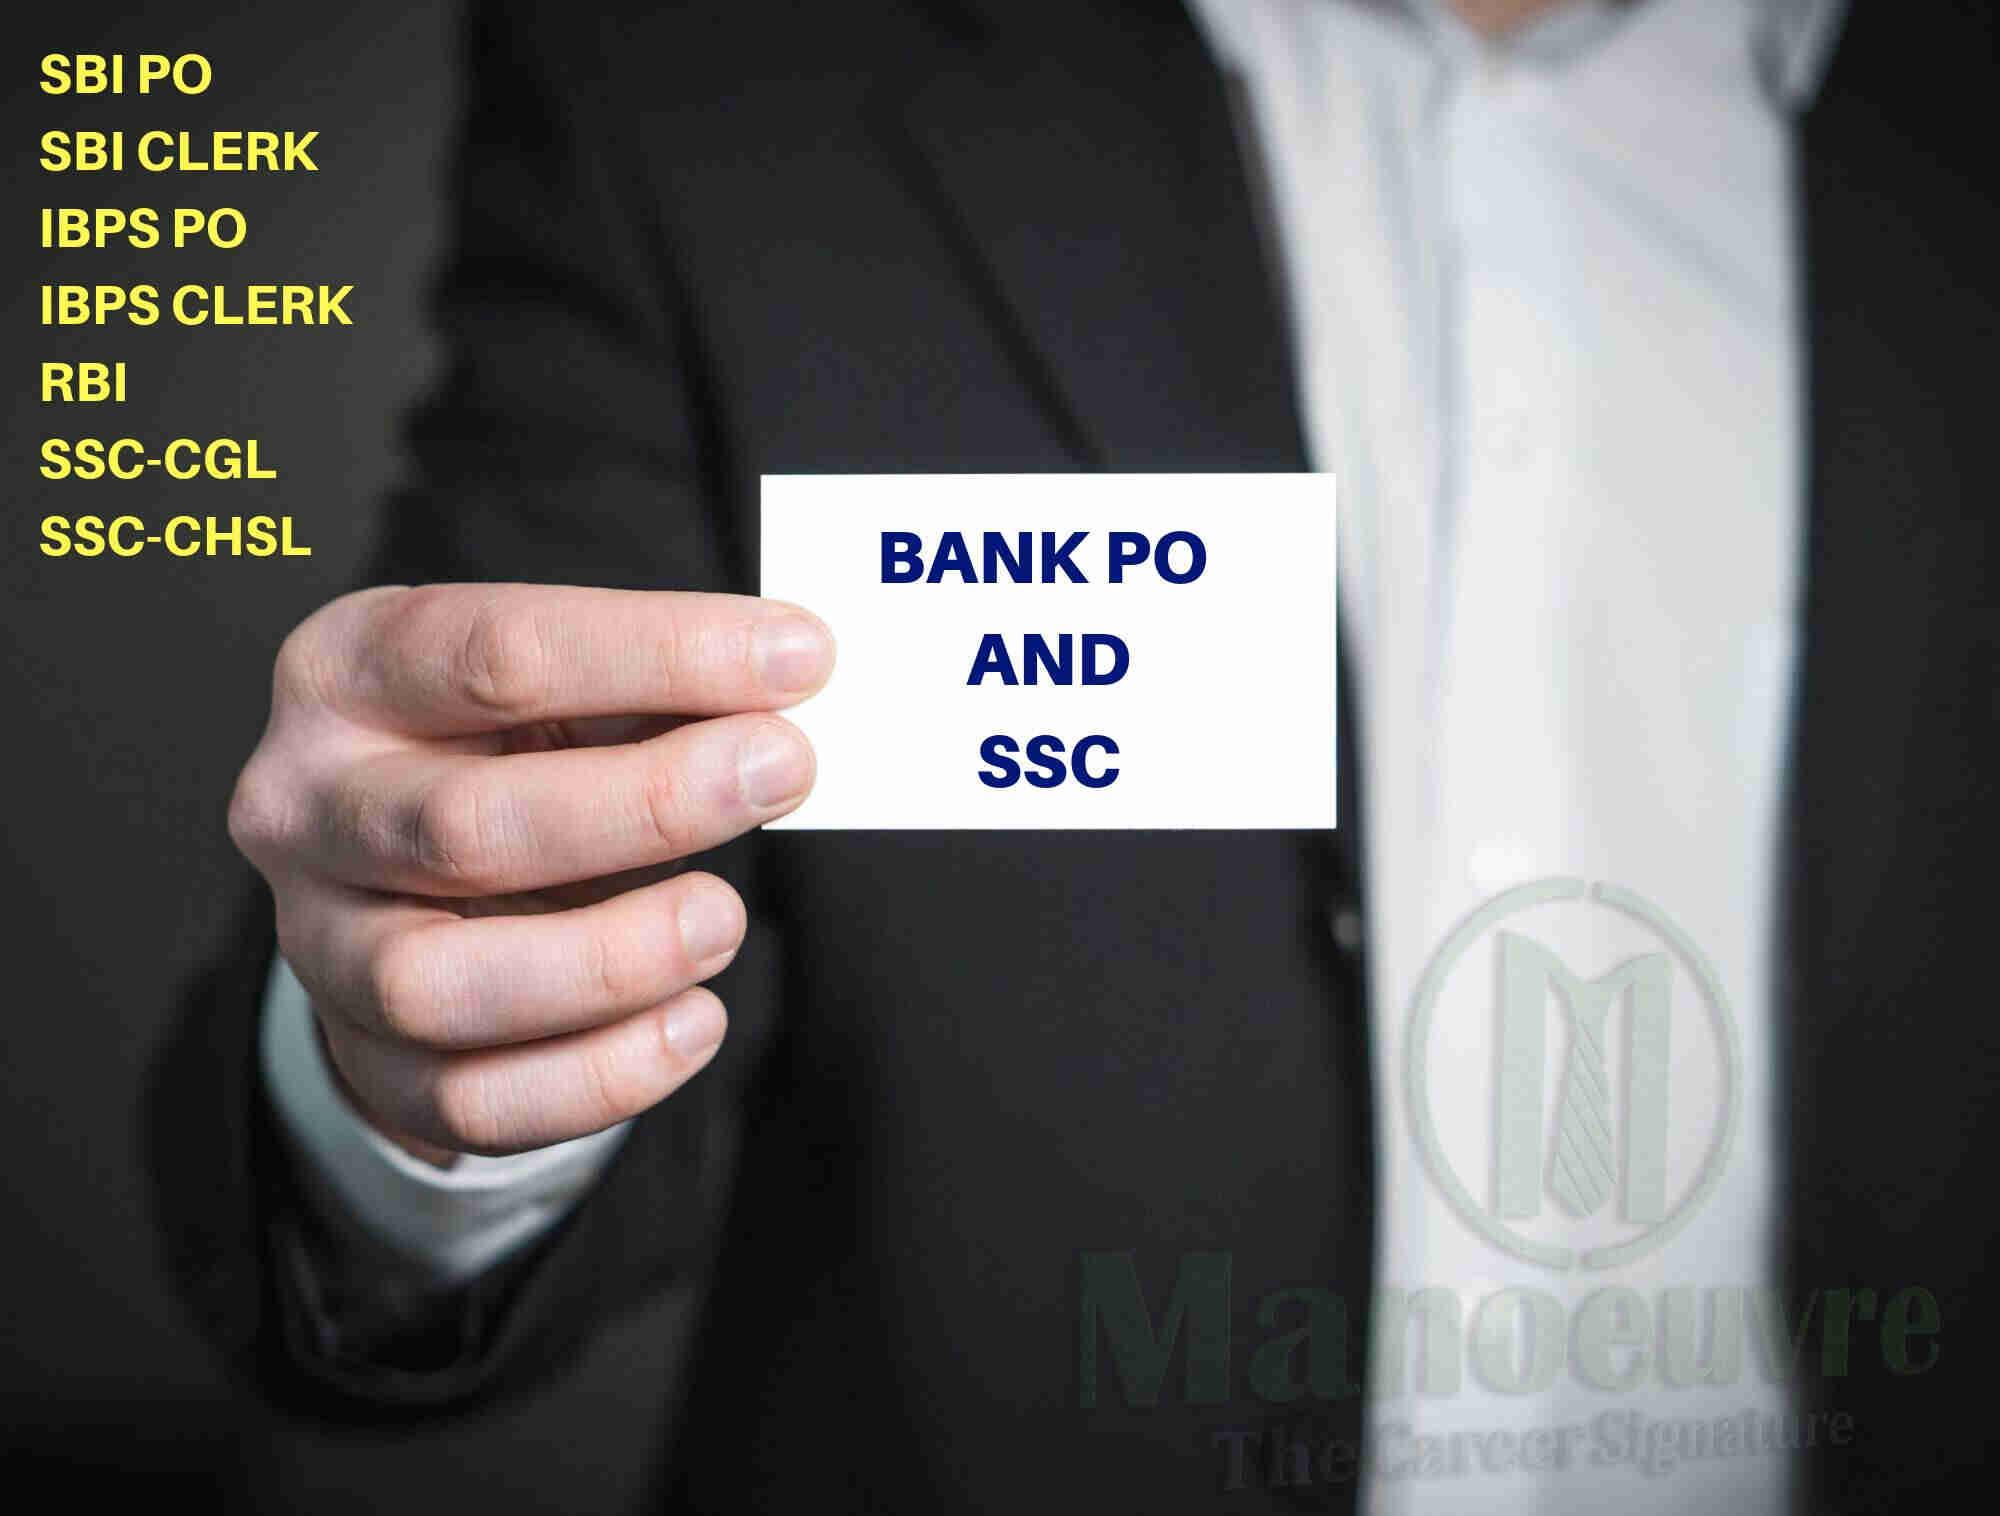 BANK PO & SSC